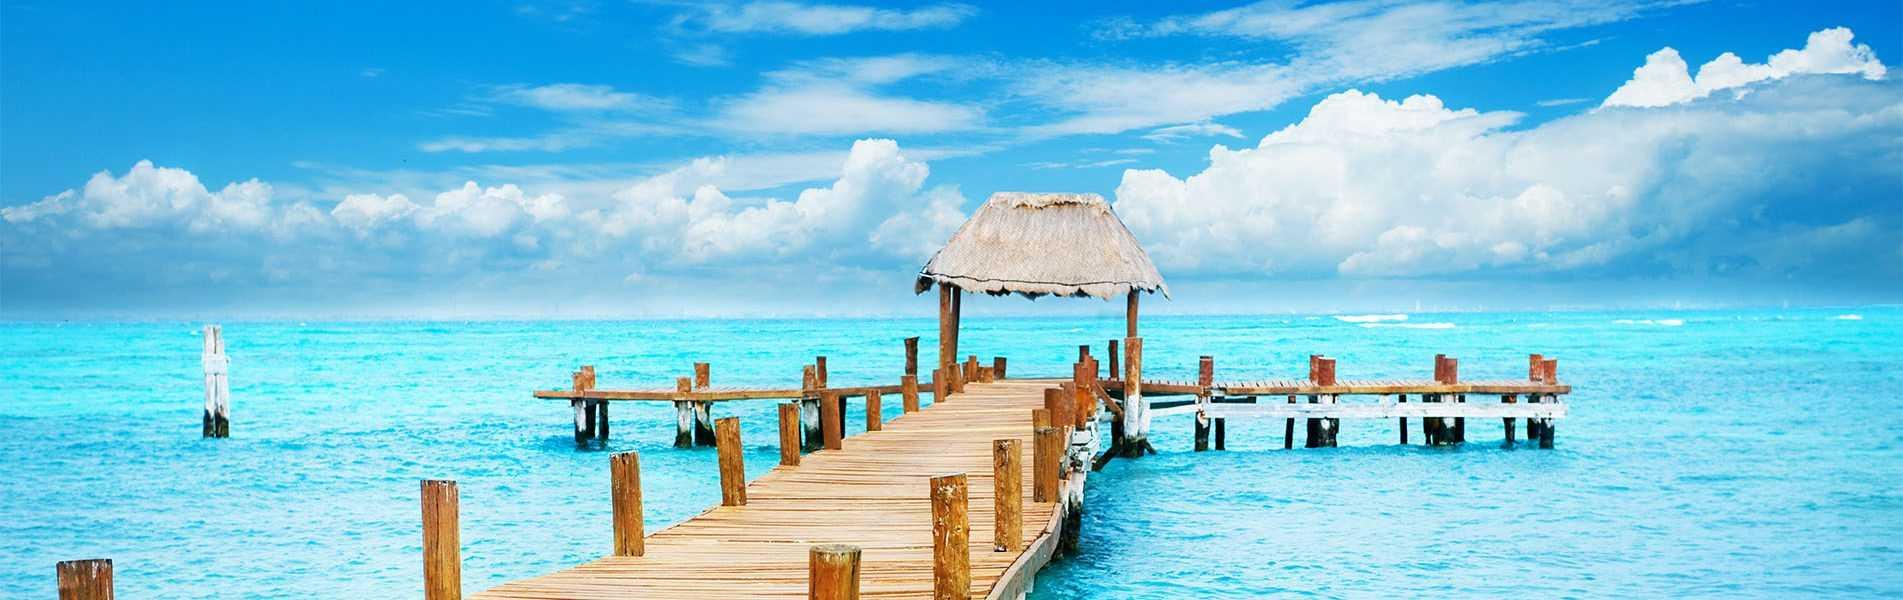 Mexico Ocean scene